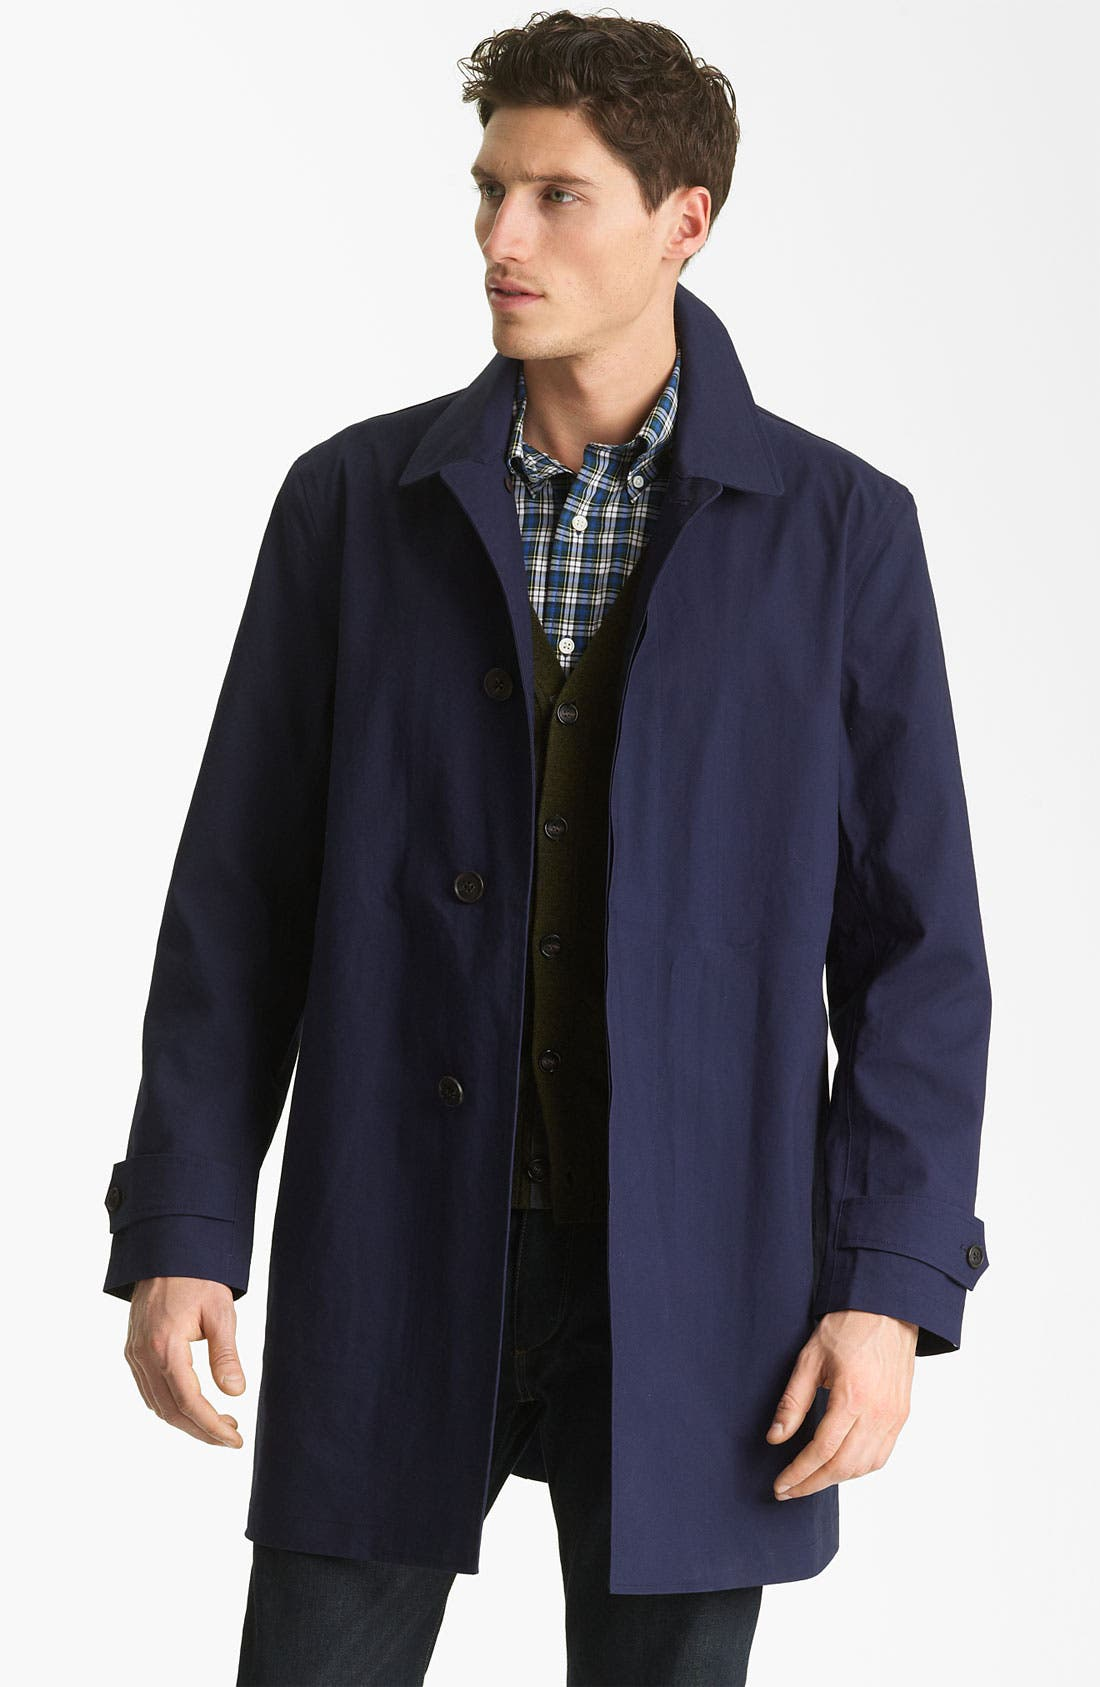 Main Image - Jack Spade Bonded Raincoat